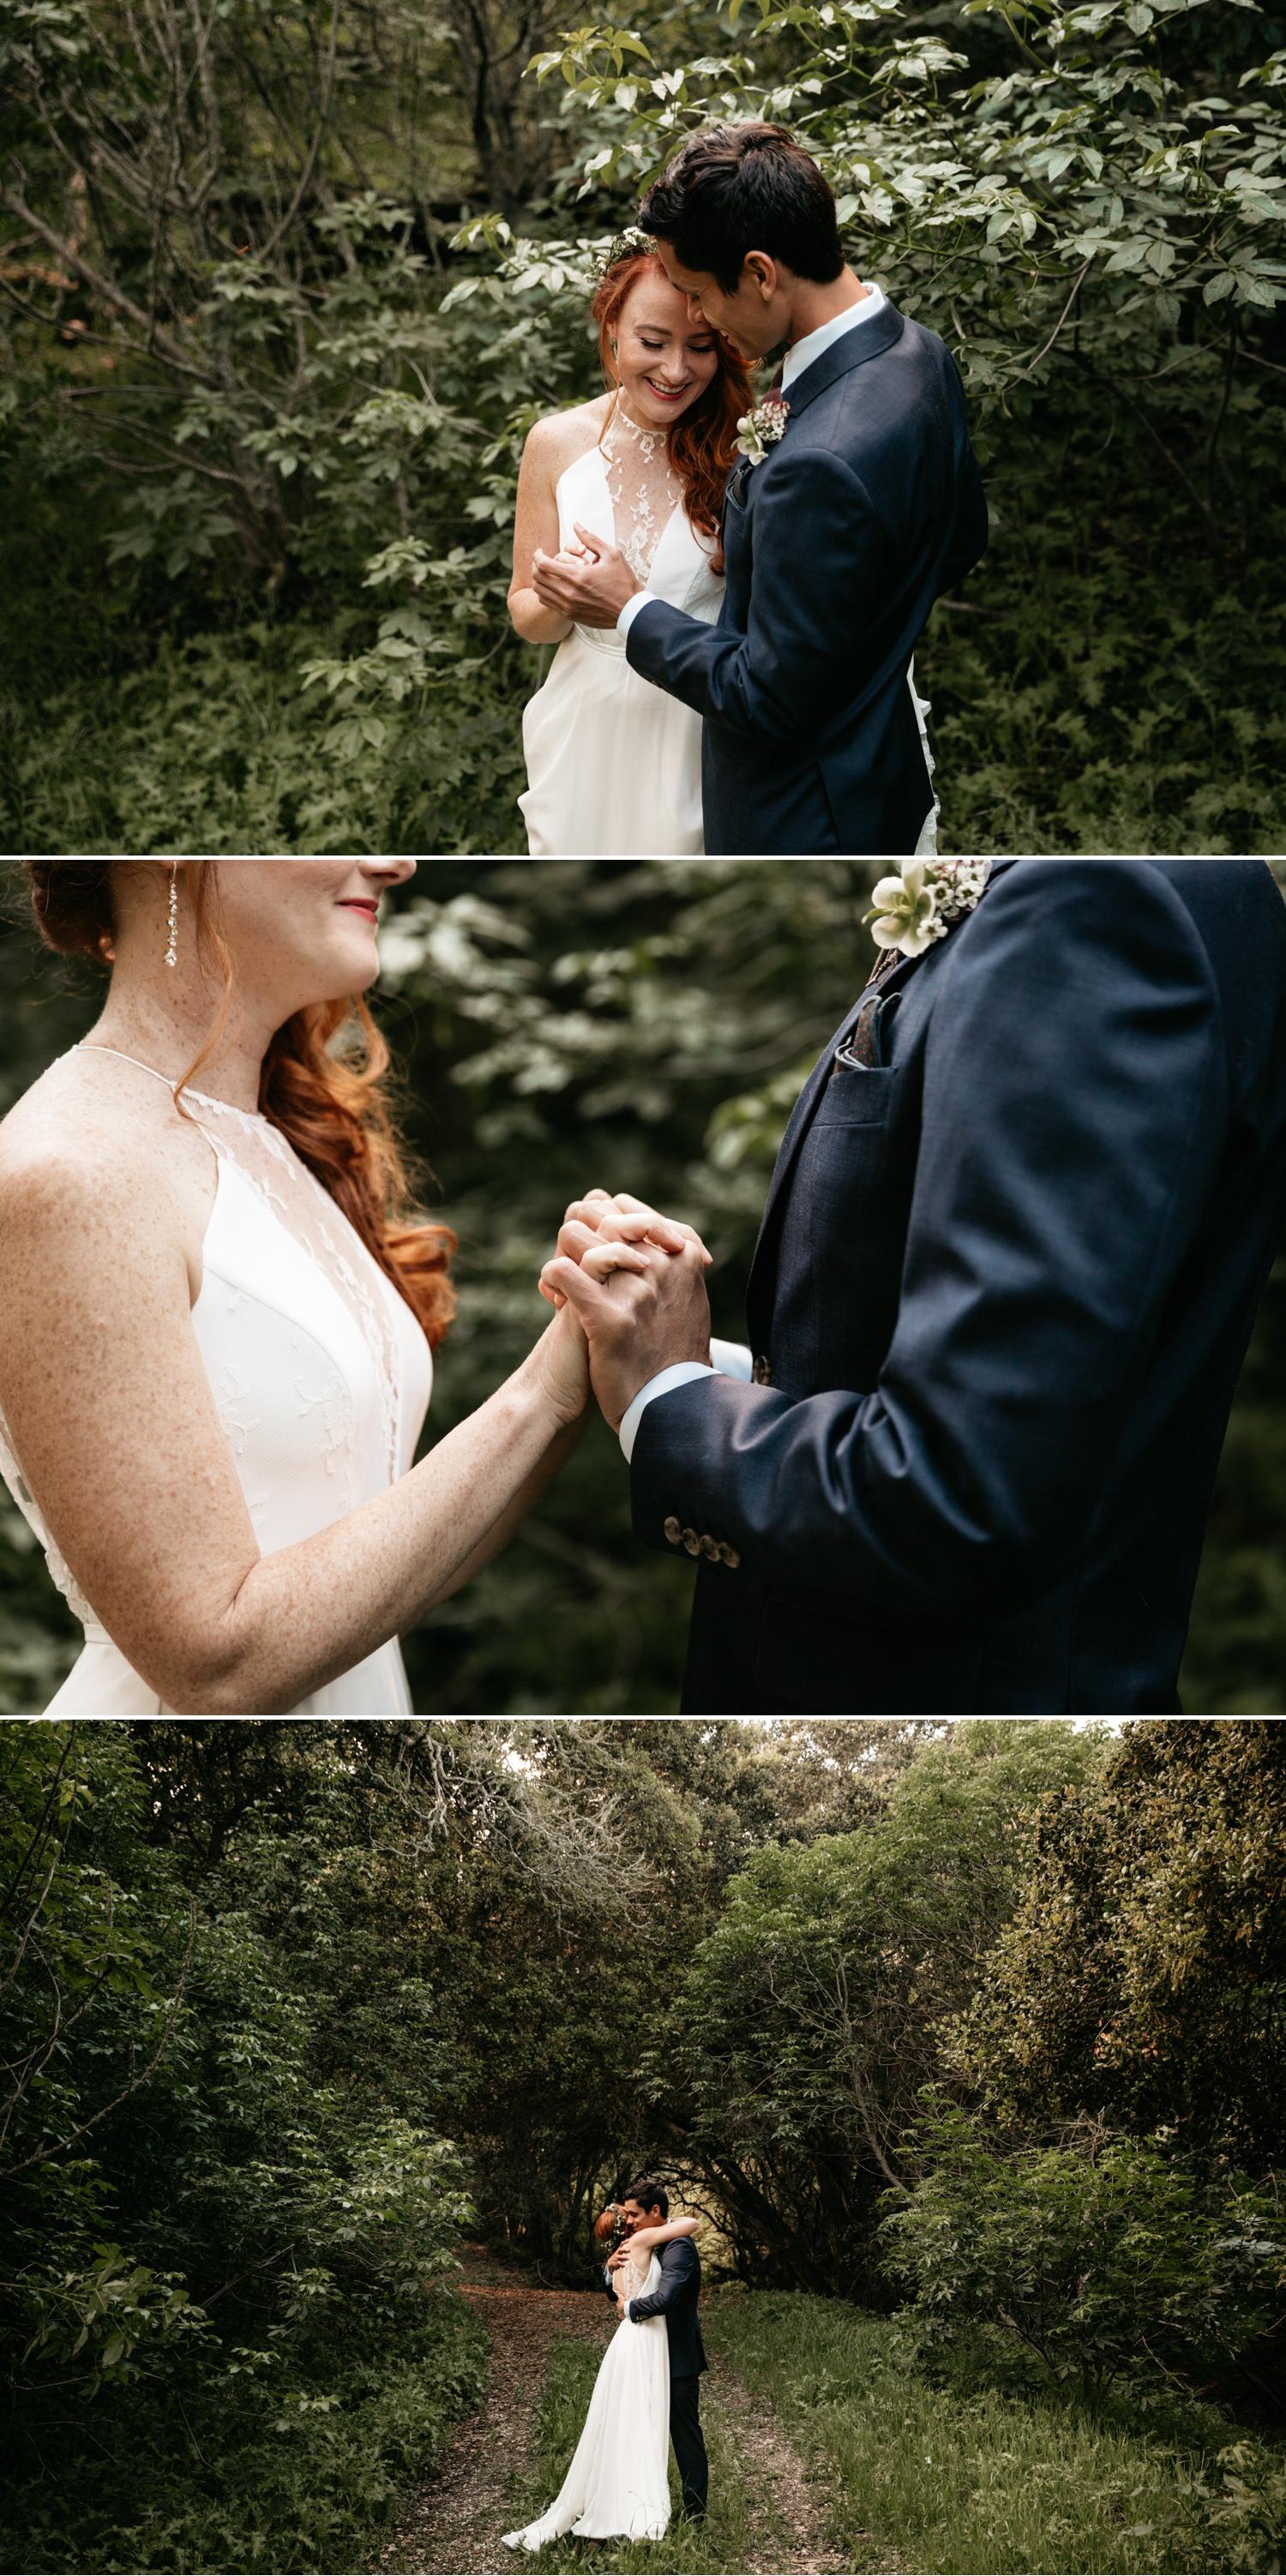 Intimate wedding first look in Santa Cruz